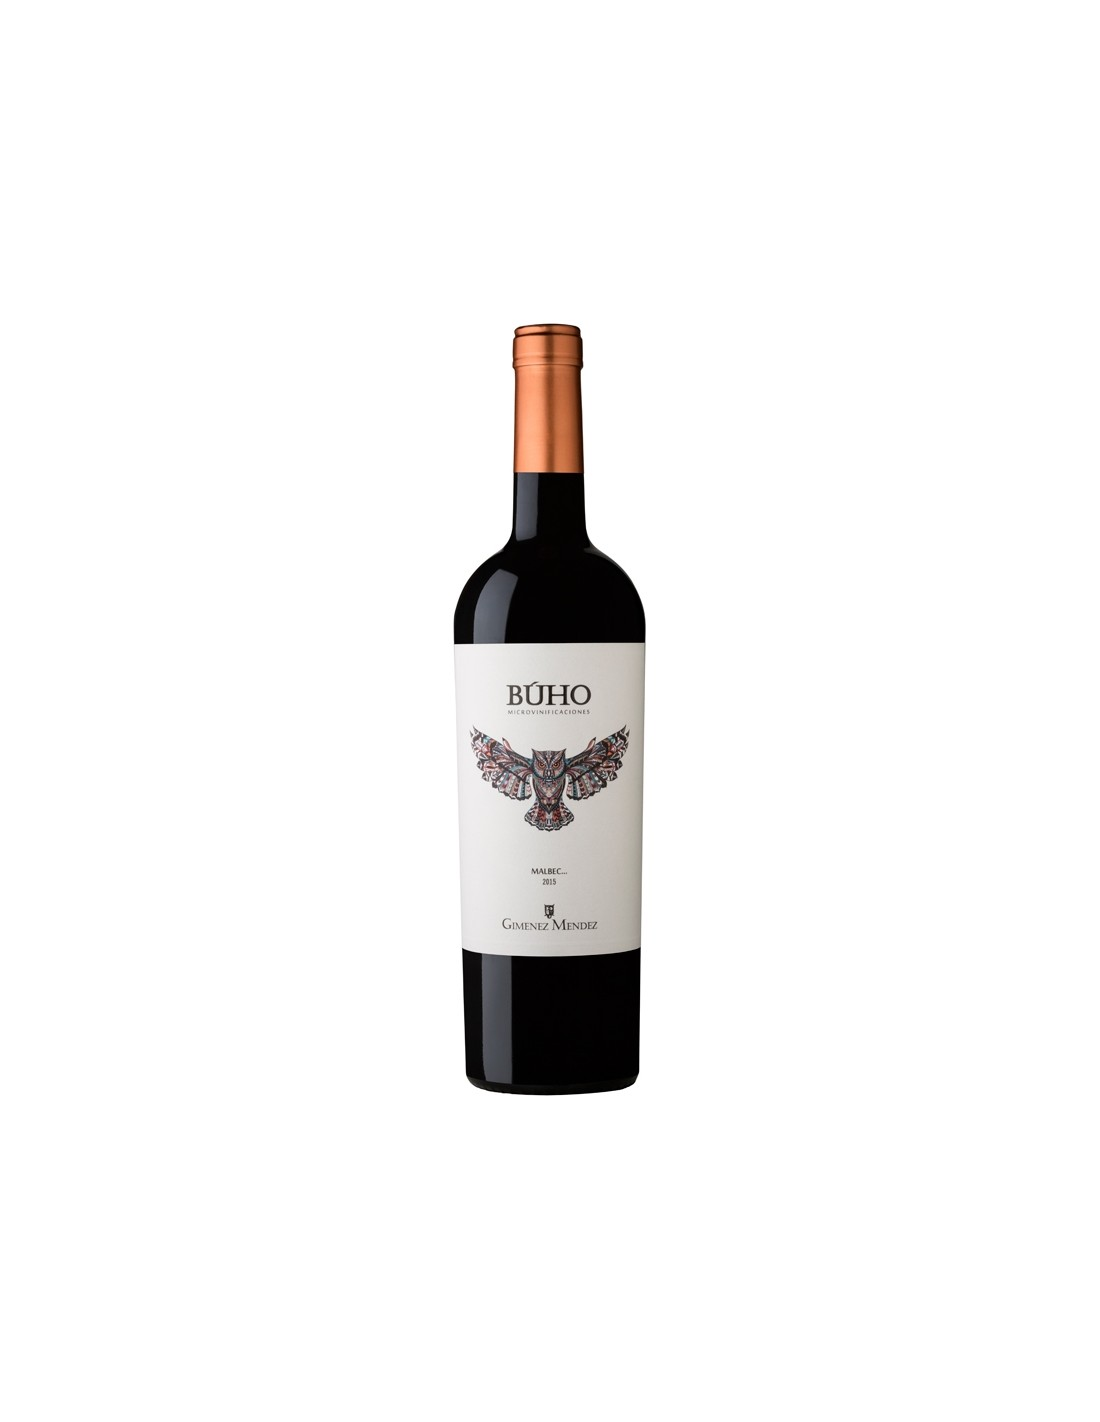 Vin rosu, Malbec, Buho Microvinificaciones, 0.75L, 14.5% alc., Uruguay